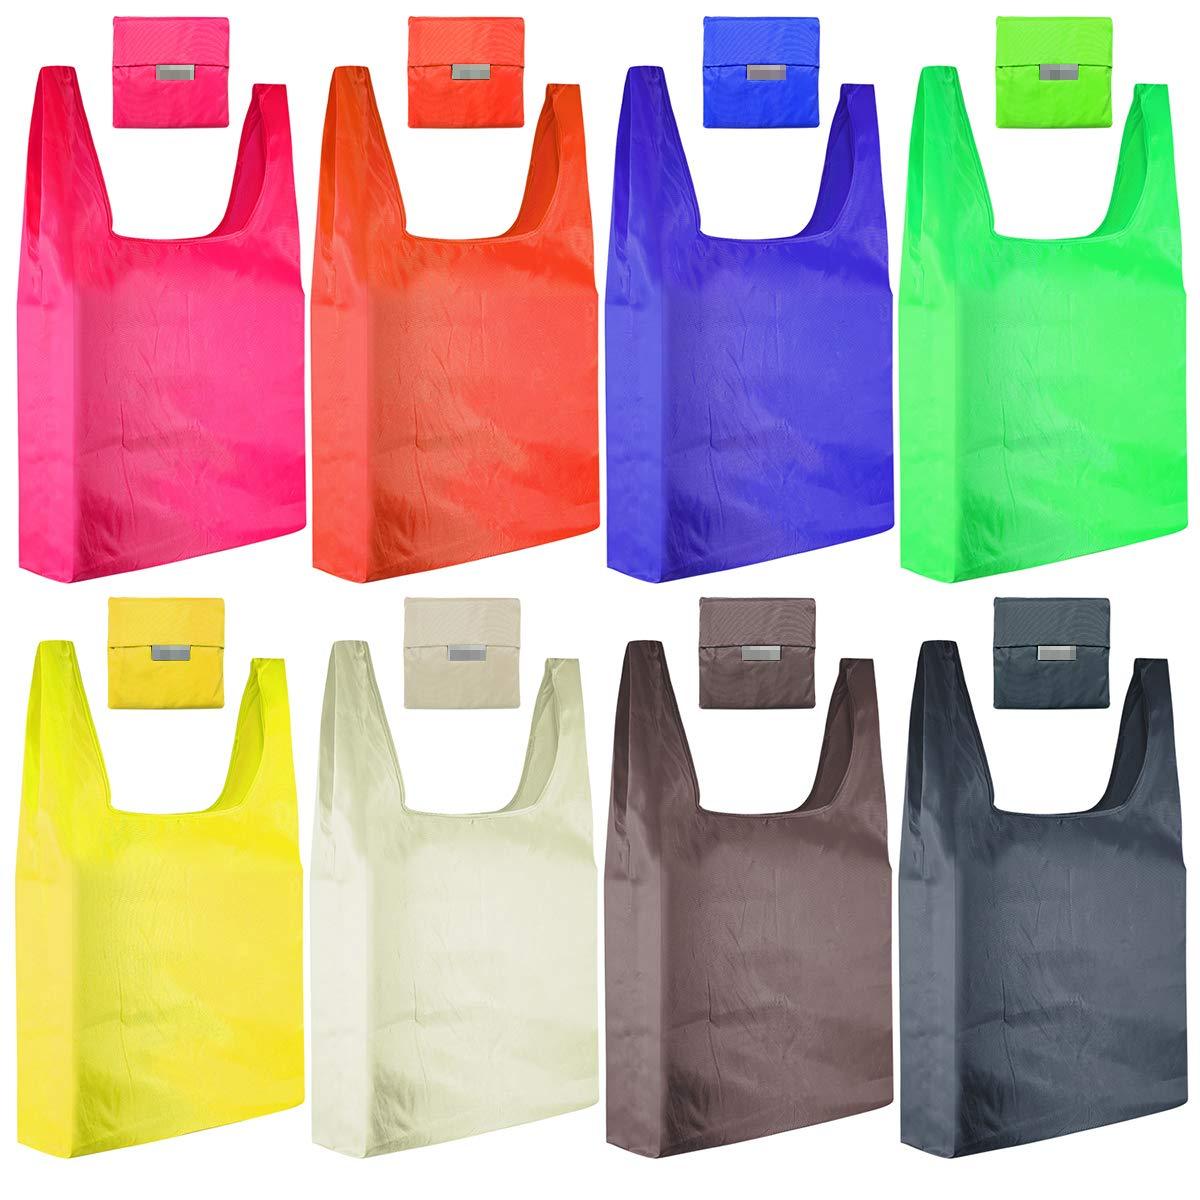 HUAYF 再利用可能な食料品袋 6枚パック キュートデザイン エコフレンドリー Lサイズ 折りたたみ式 ショッピングバッグ ポケットにフィット 防水 洗濯機洗い可能 B07J3LLPJT パターン1